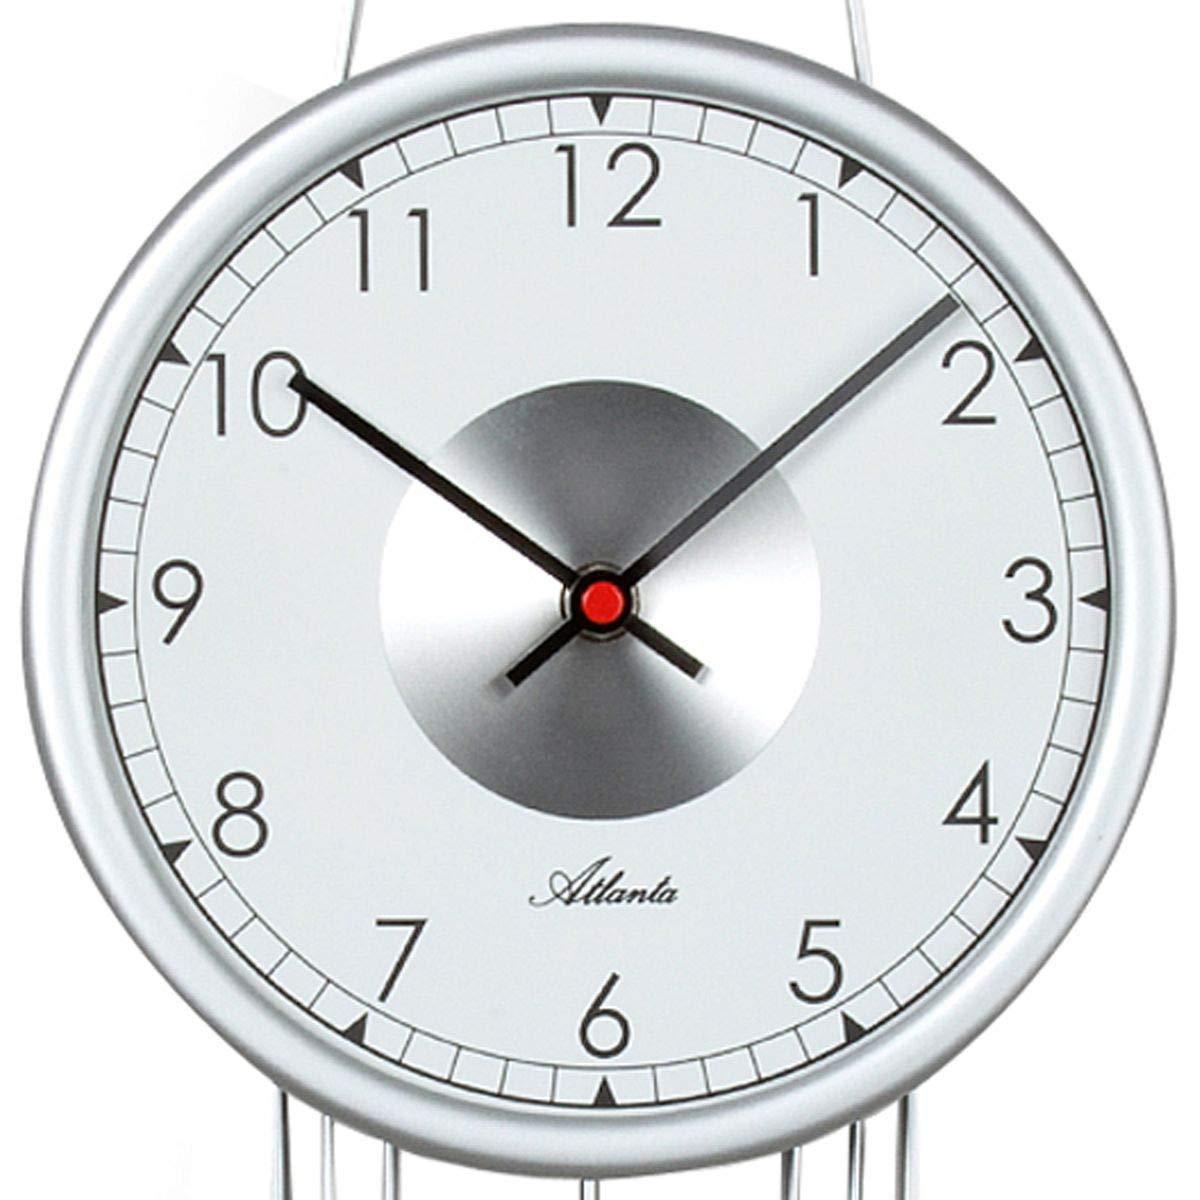 CV Design Wanduhr mit Pendel silbern Pendeluhr Quarz analog modern Mineralglas 59 x 20 cm